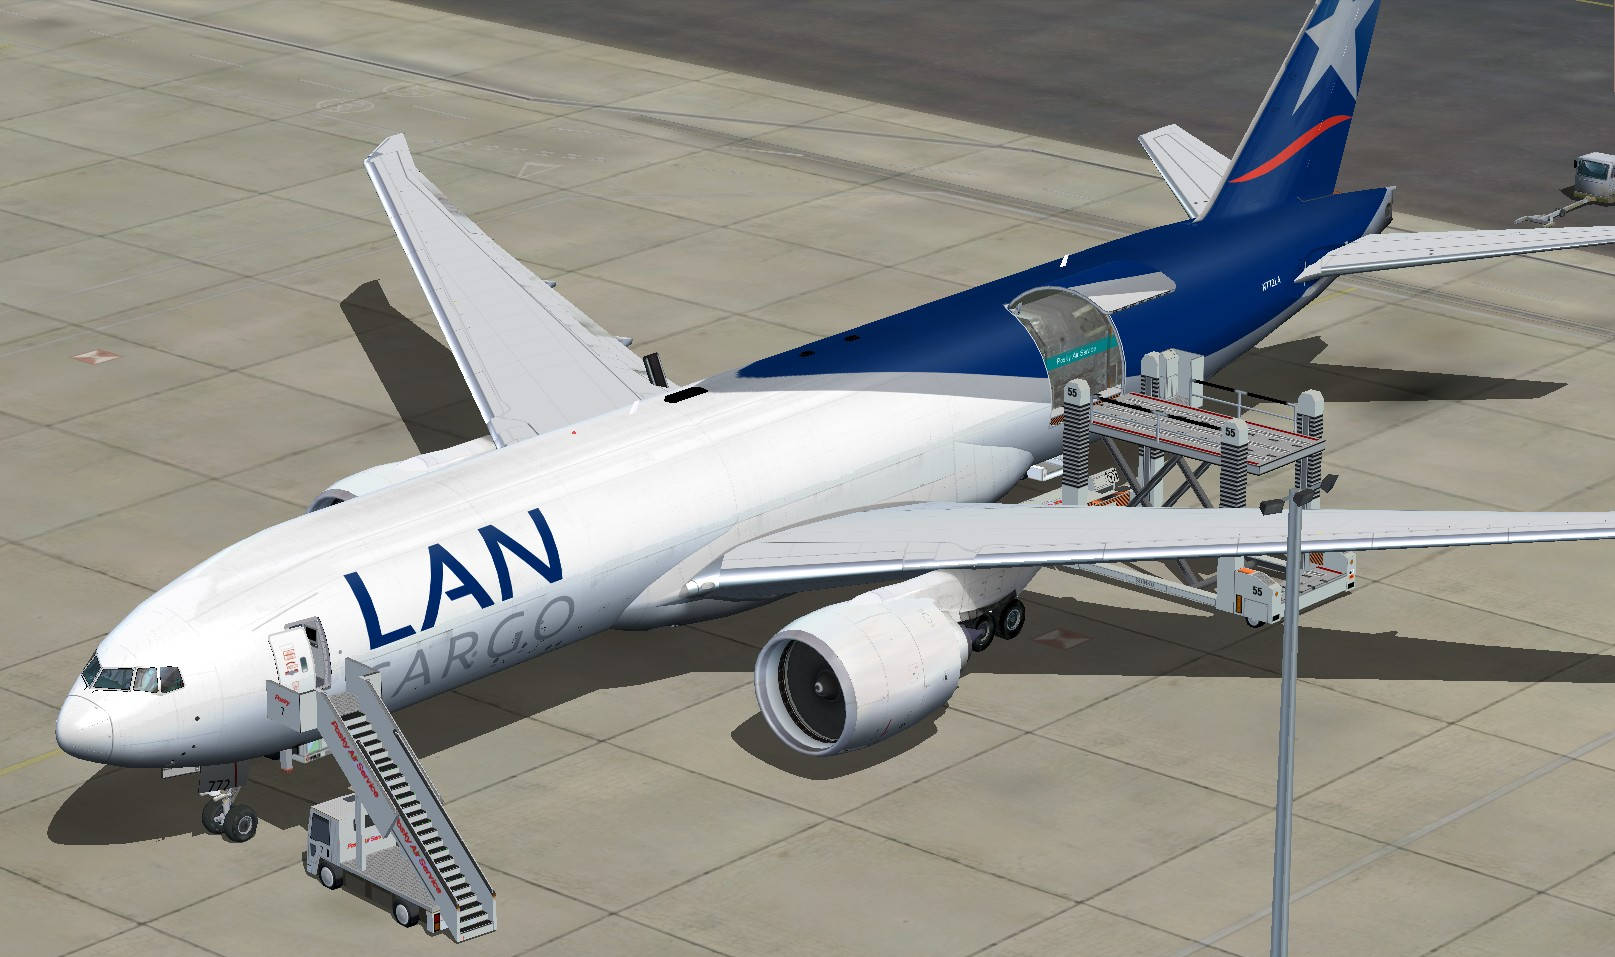 fs-freeware.net - Cargo Aircraft